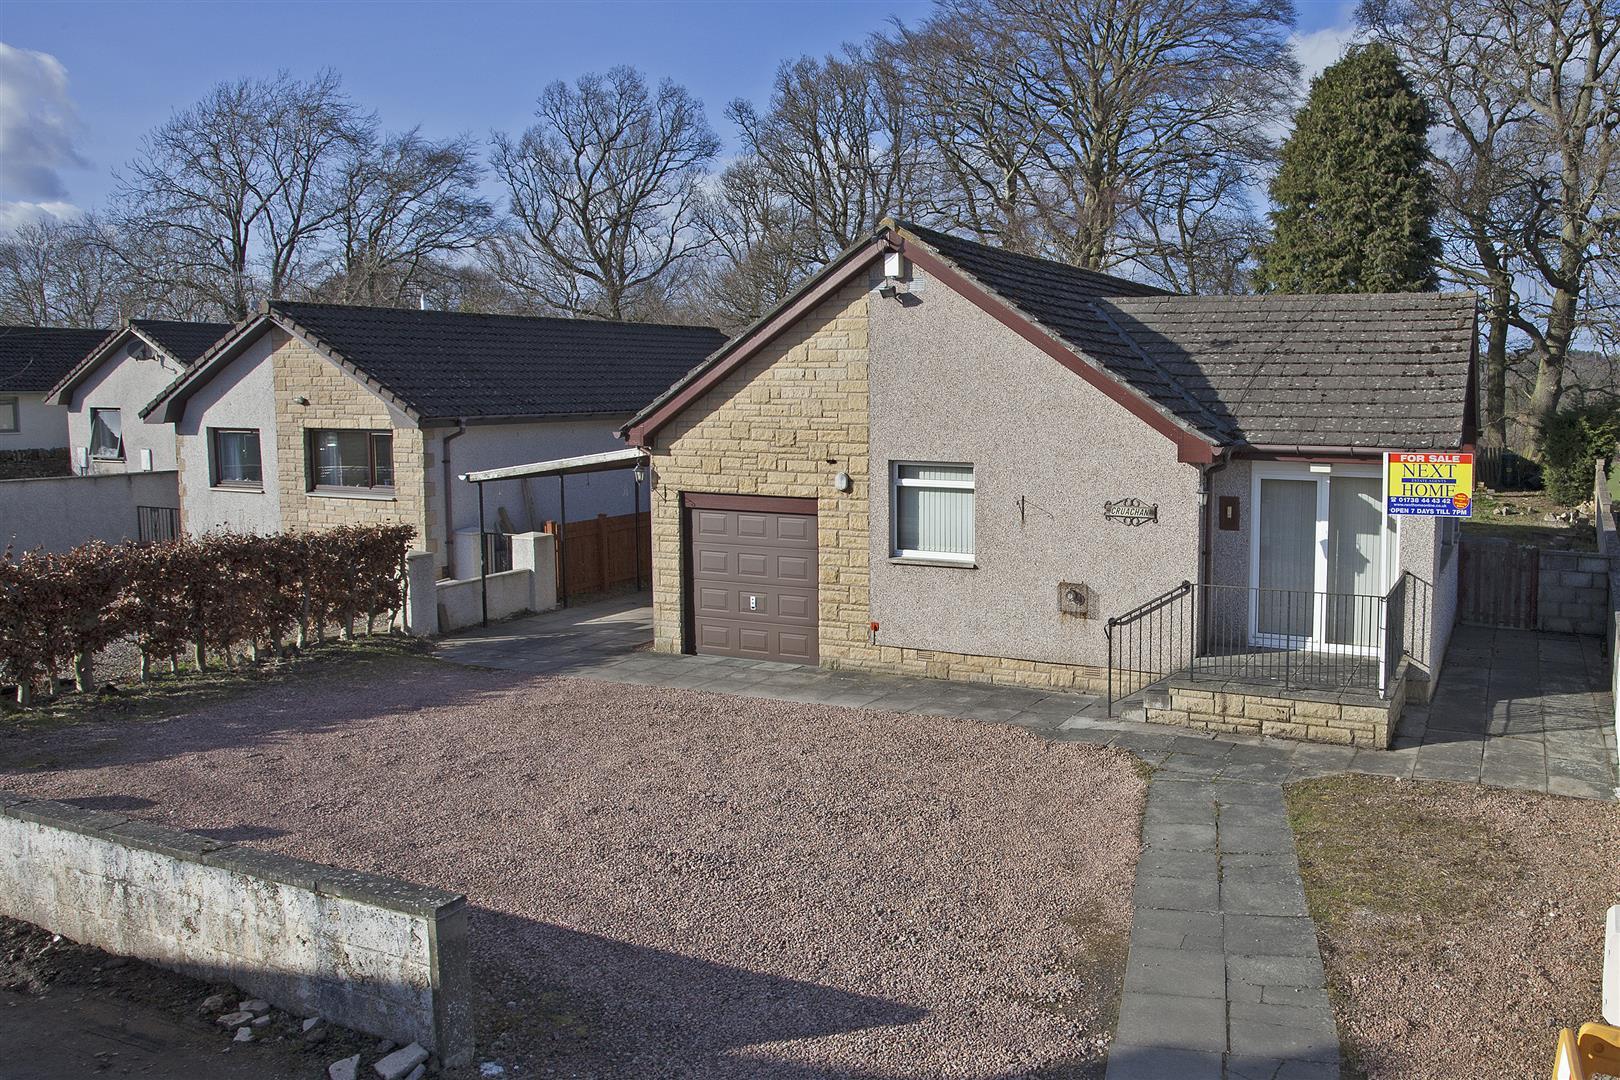 Cruachan, West Huntingtower, Perthshire, PH1 3NU, UK